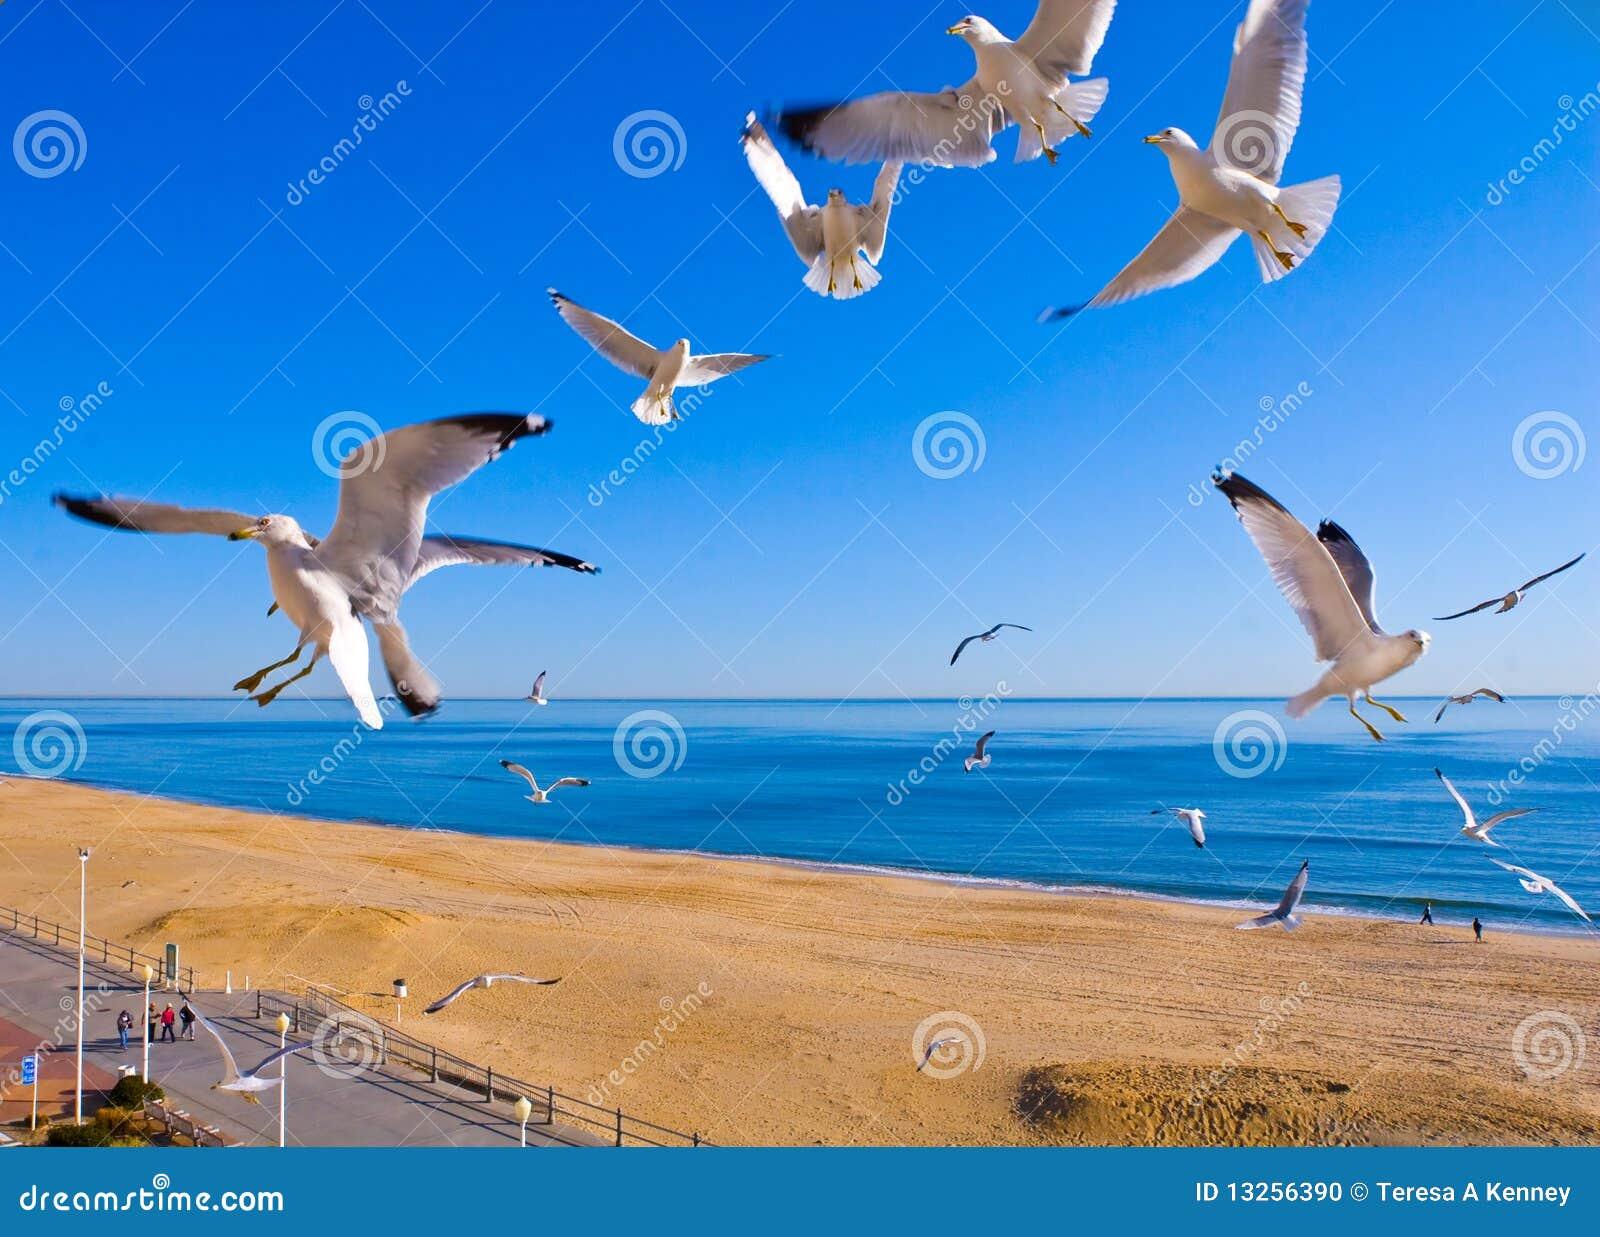 Seagulls Flying at Beach